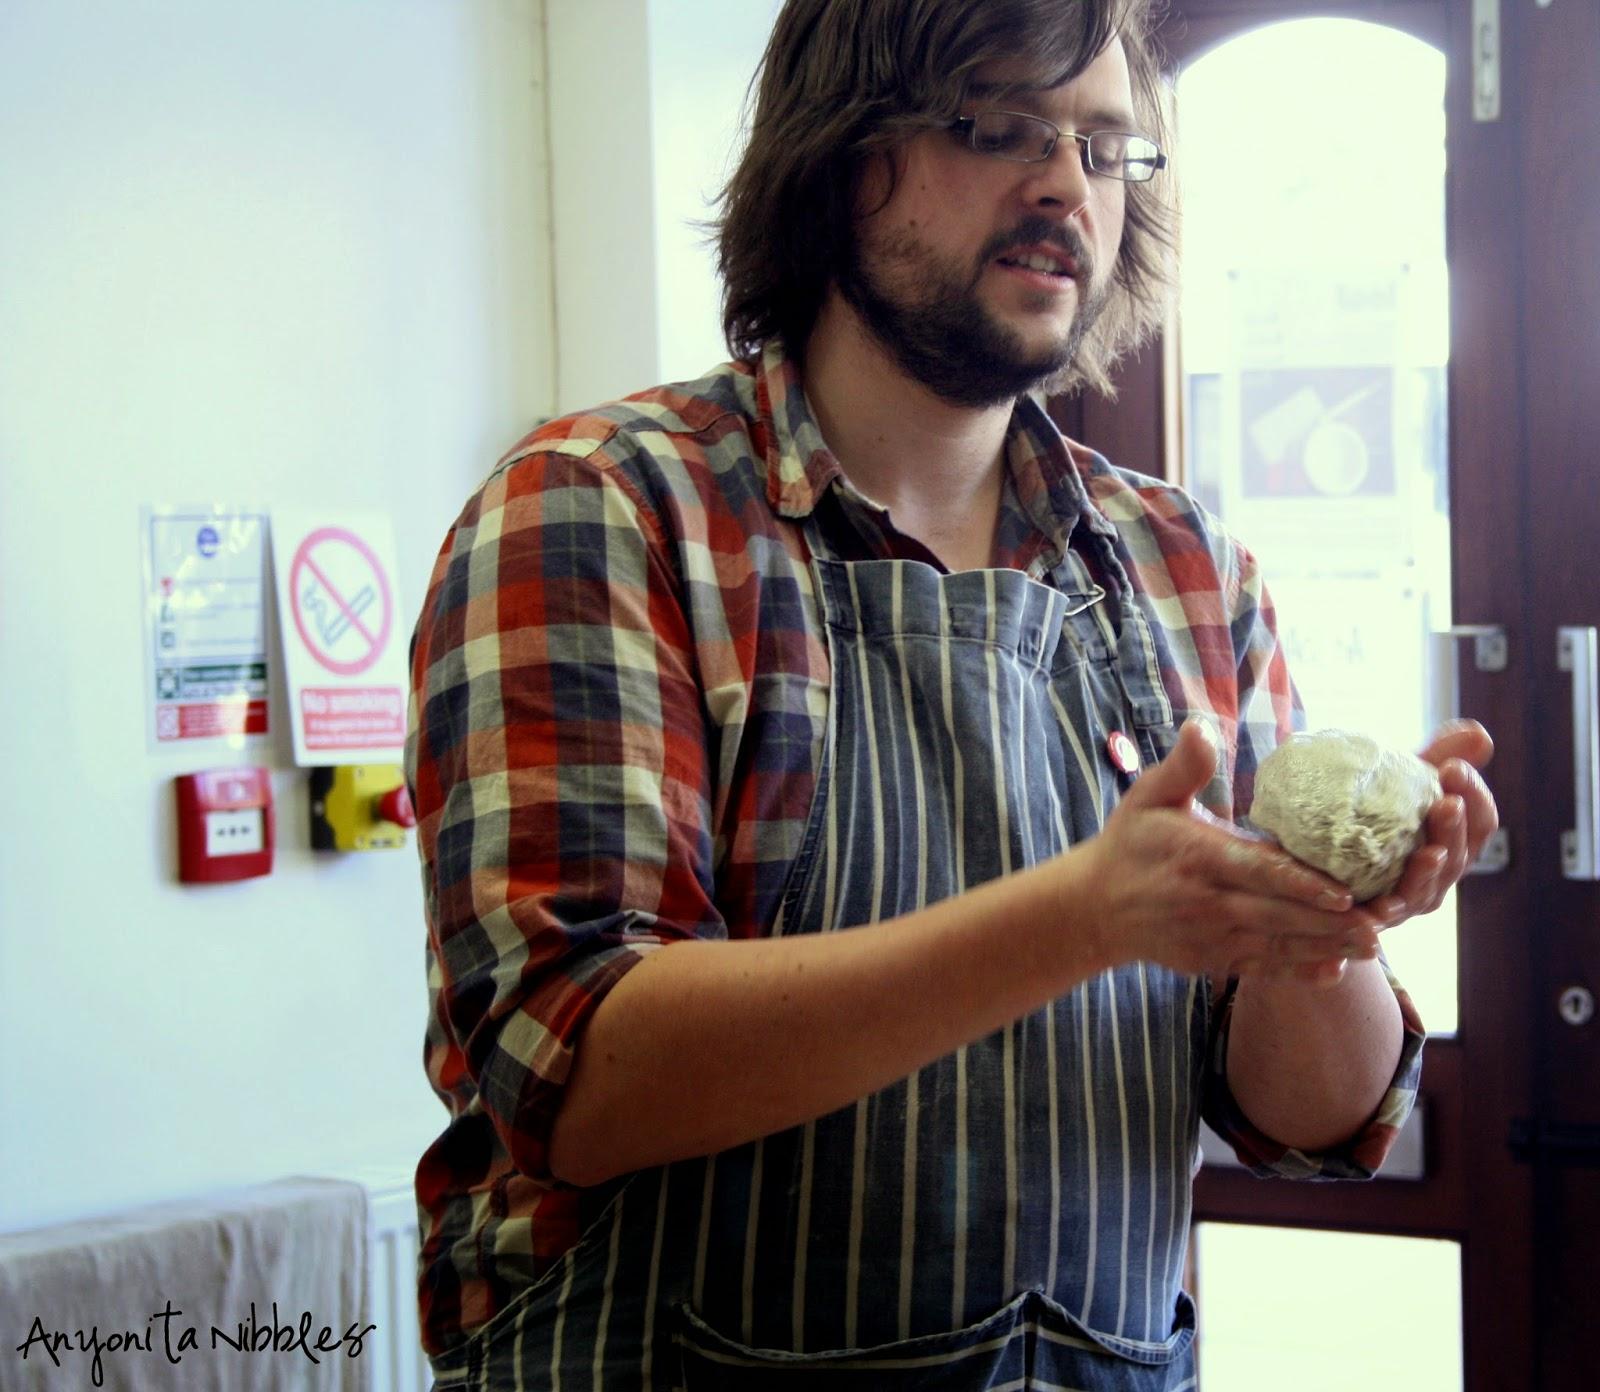 Tom Baker of Loaf in Stirchley, Birmingham